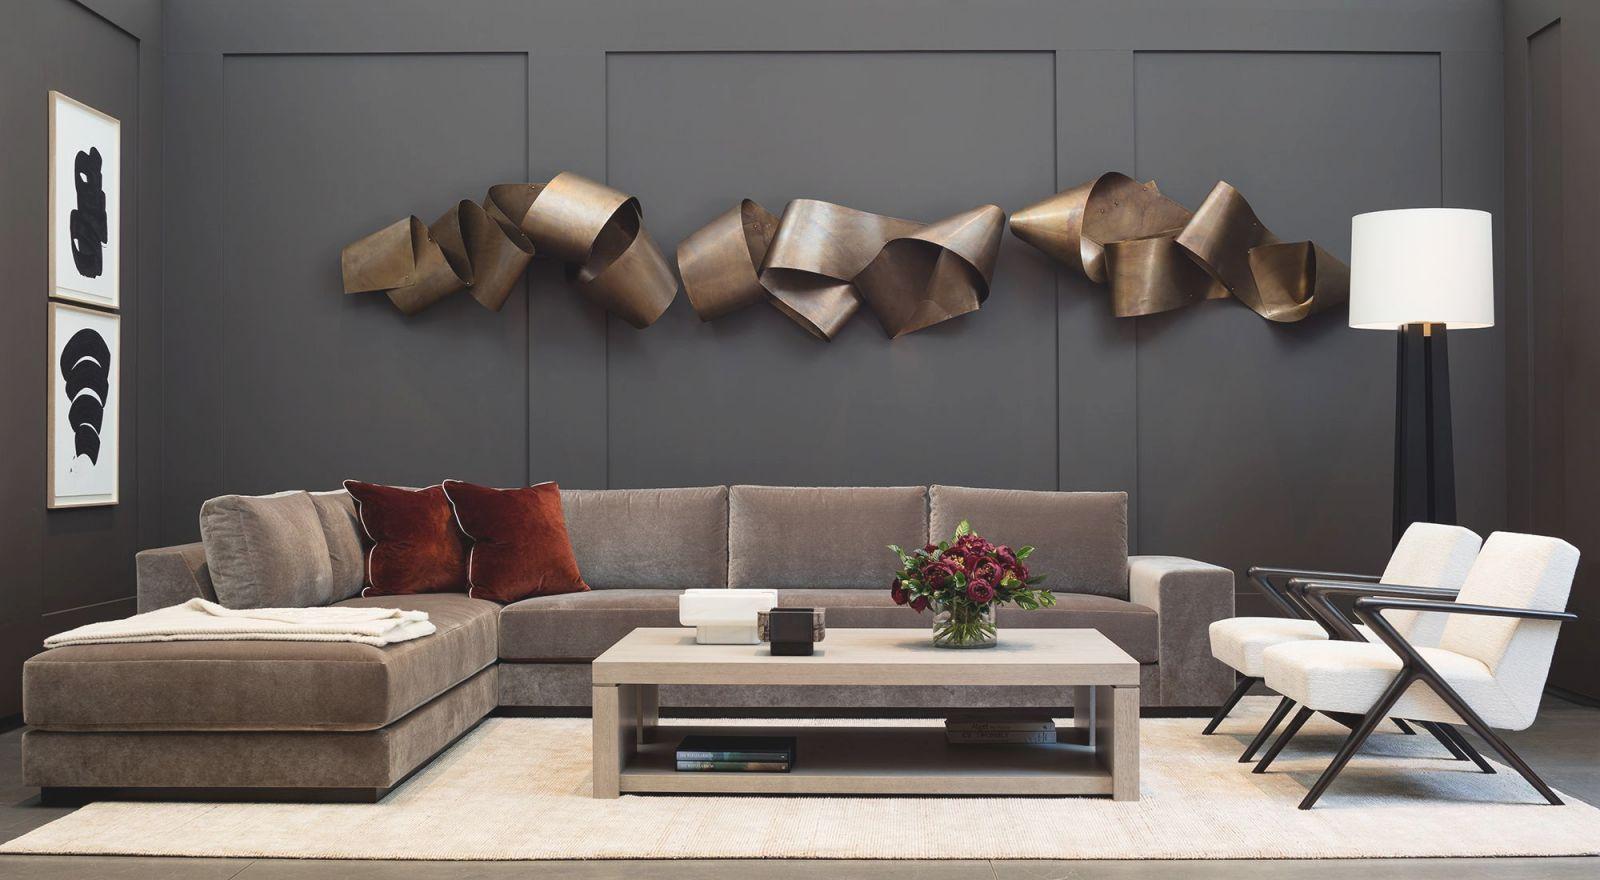 Pin On 墙饰 regarding Modern Wall Decor For Living Room